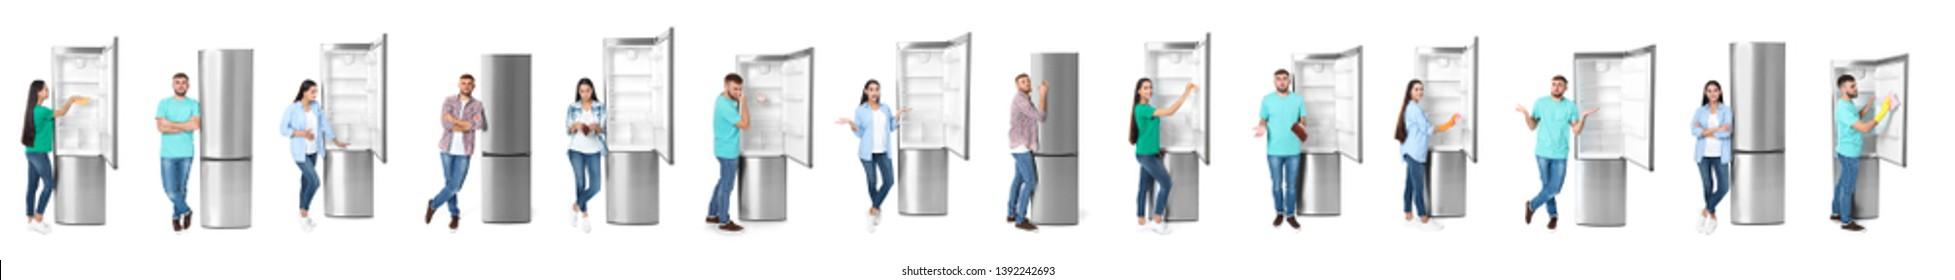 Set of people near modern refrigerators on white background